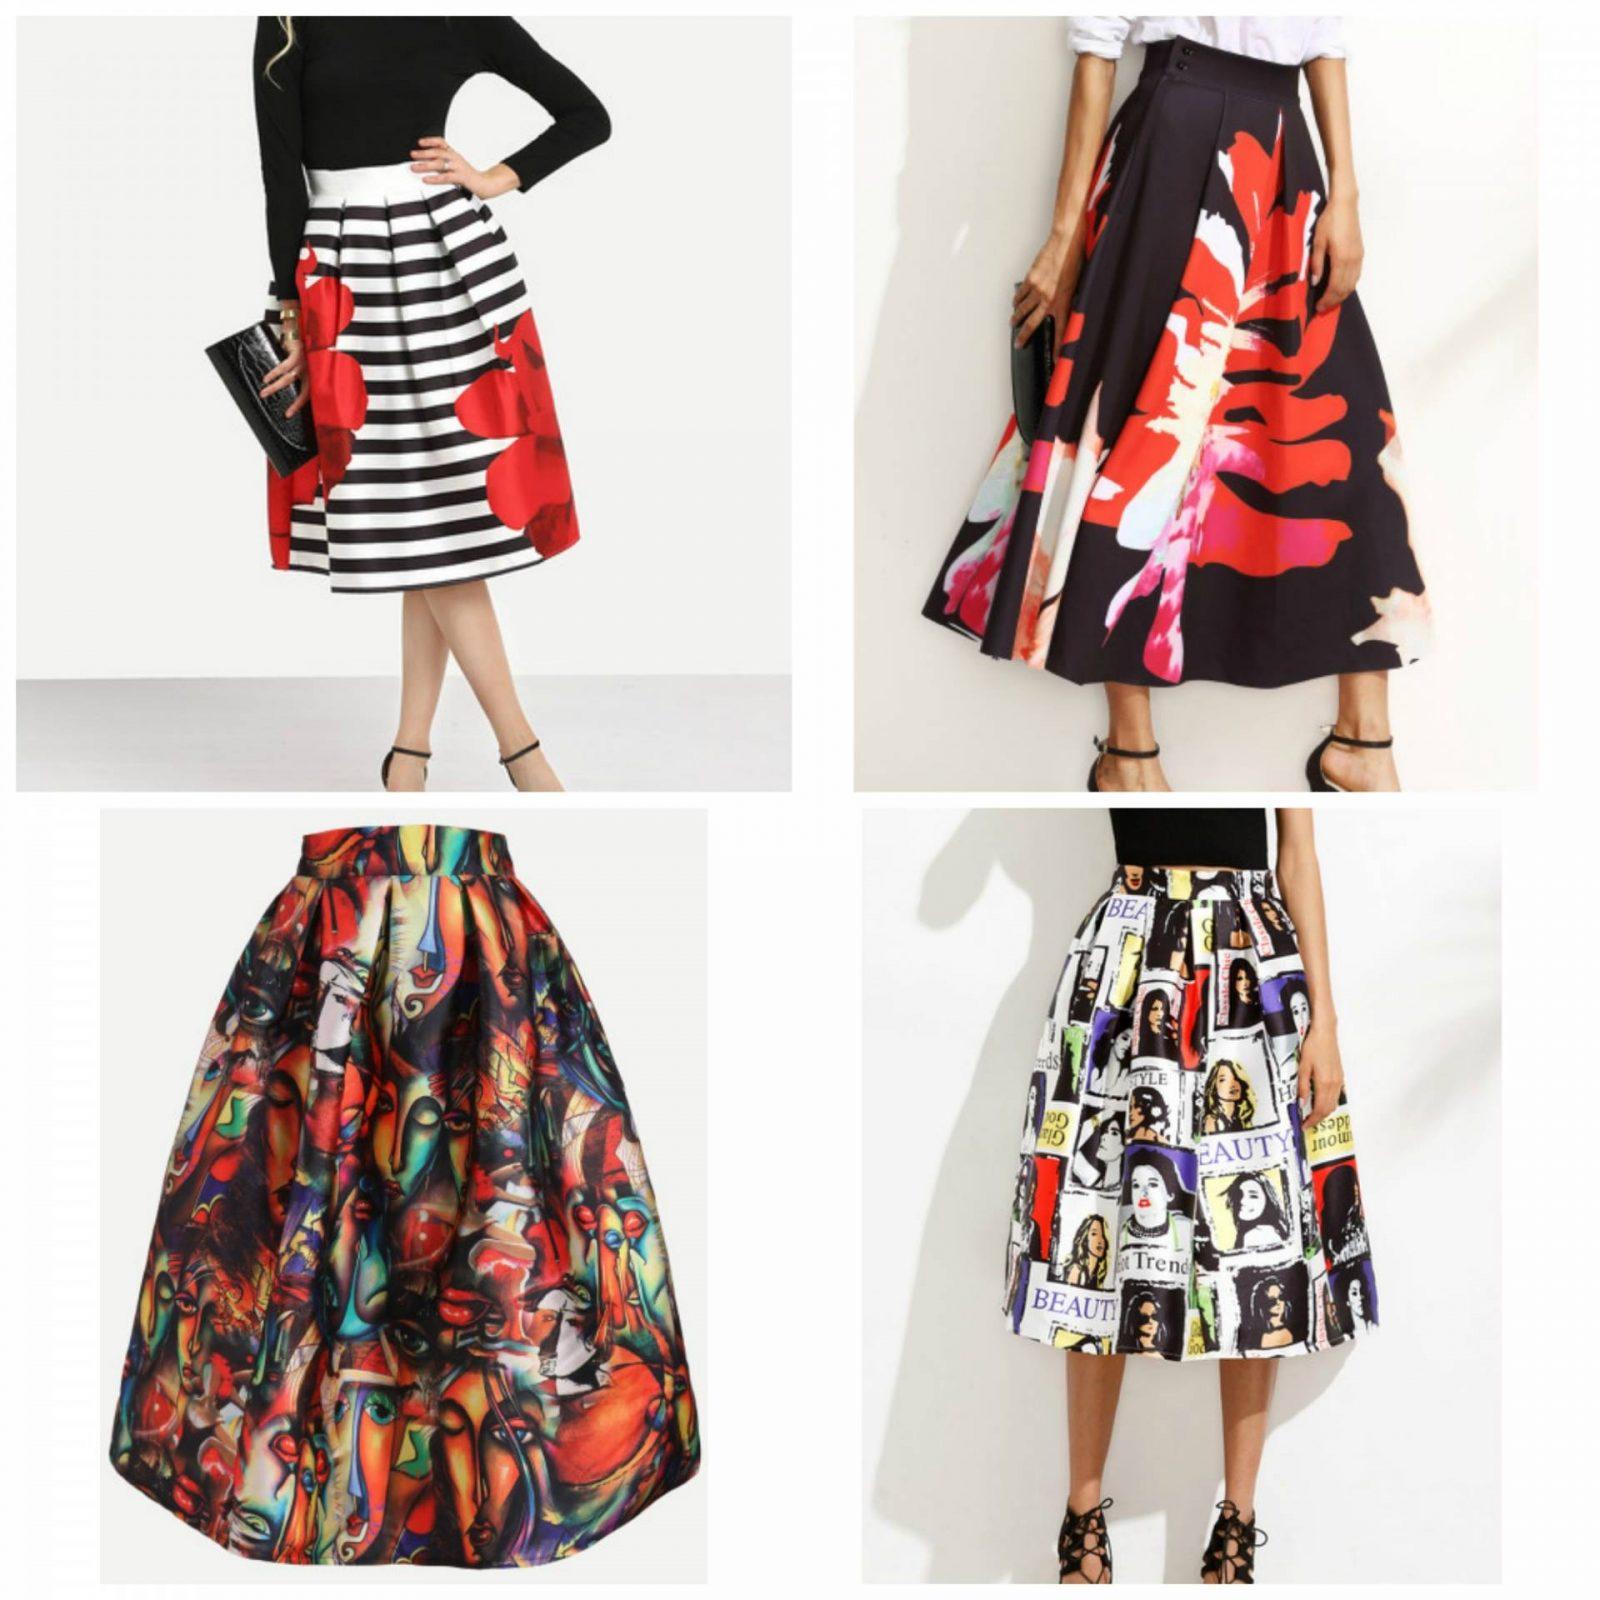 SheIn Wishlist skirts